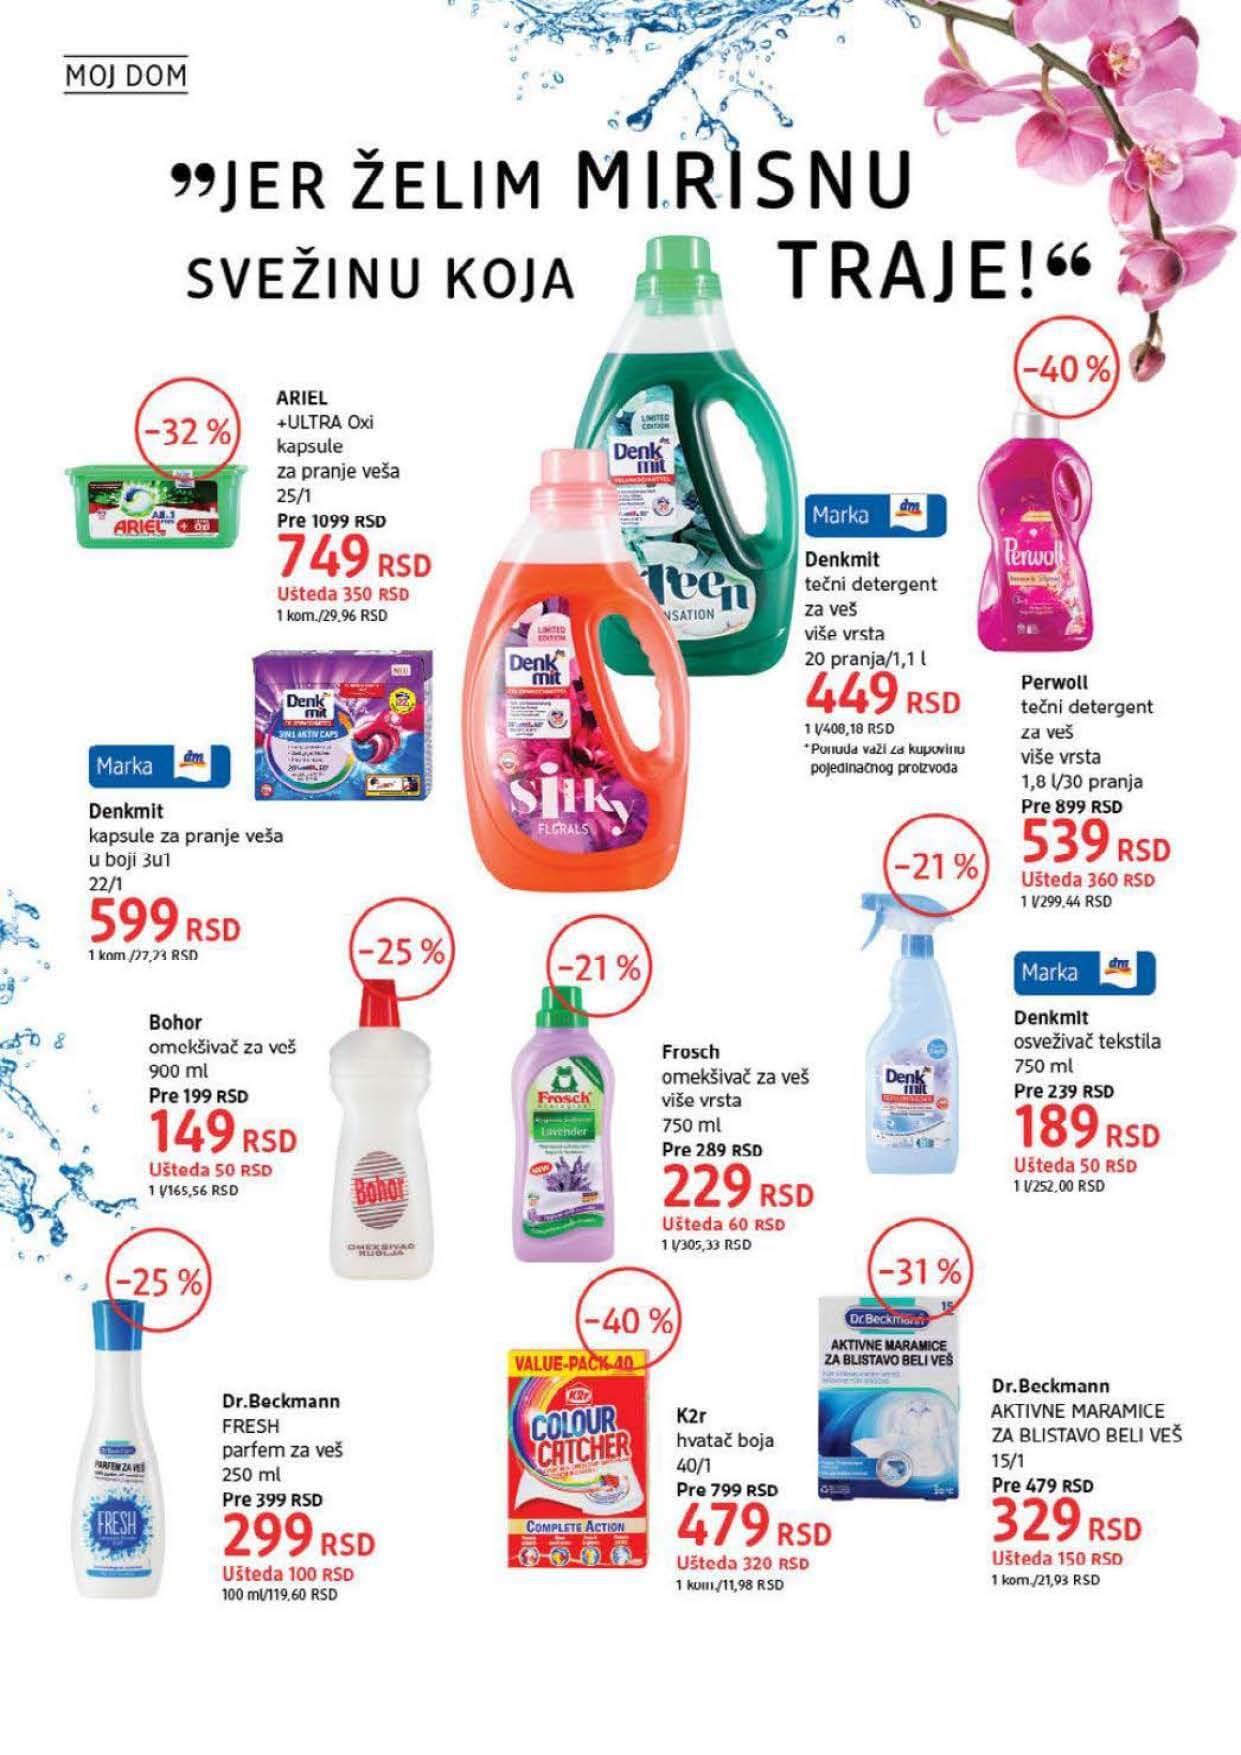 DM Katalog Srbija SEPTEMBAR 2021 1.9.2021. 30.9.2021. Page 38